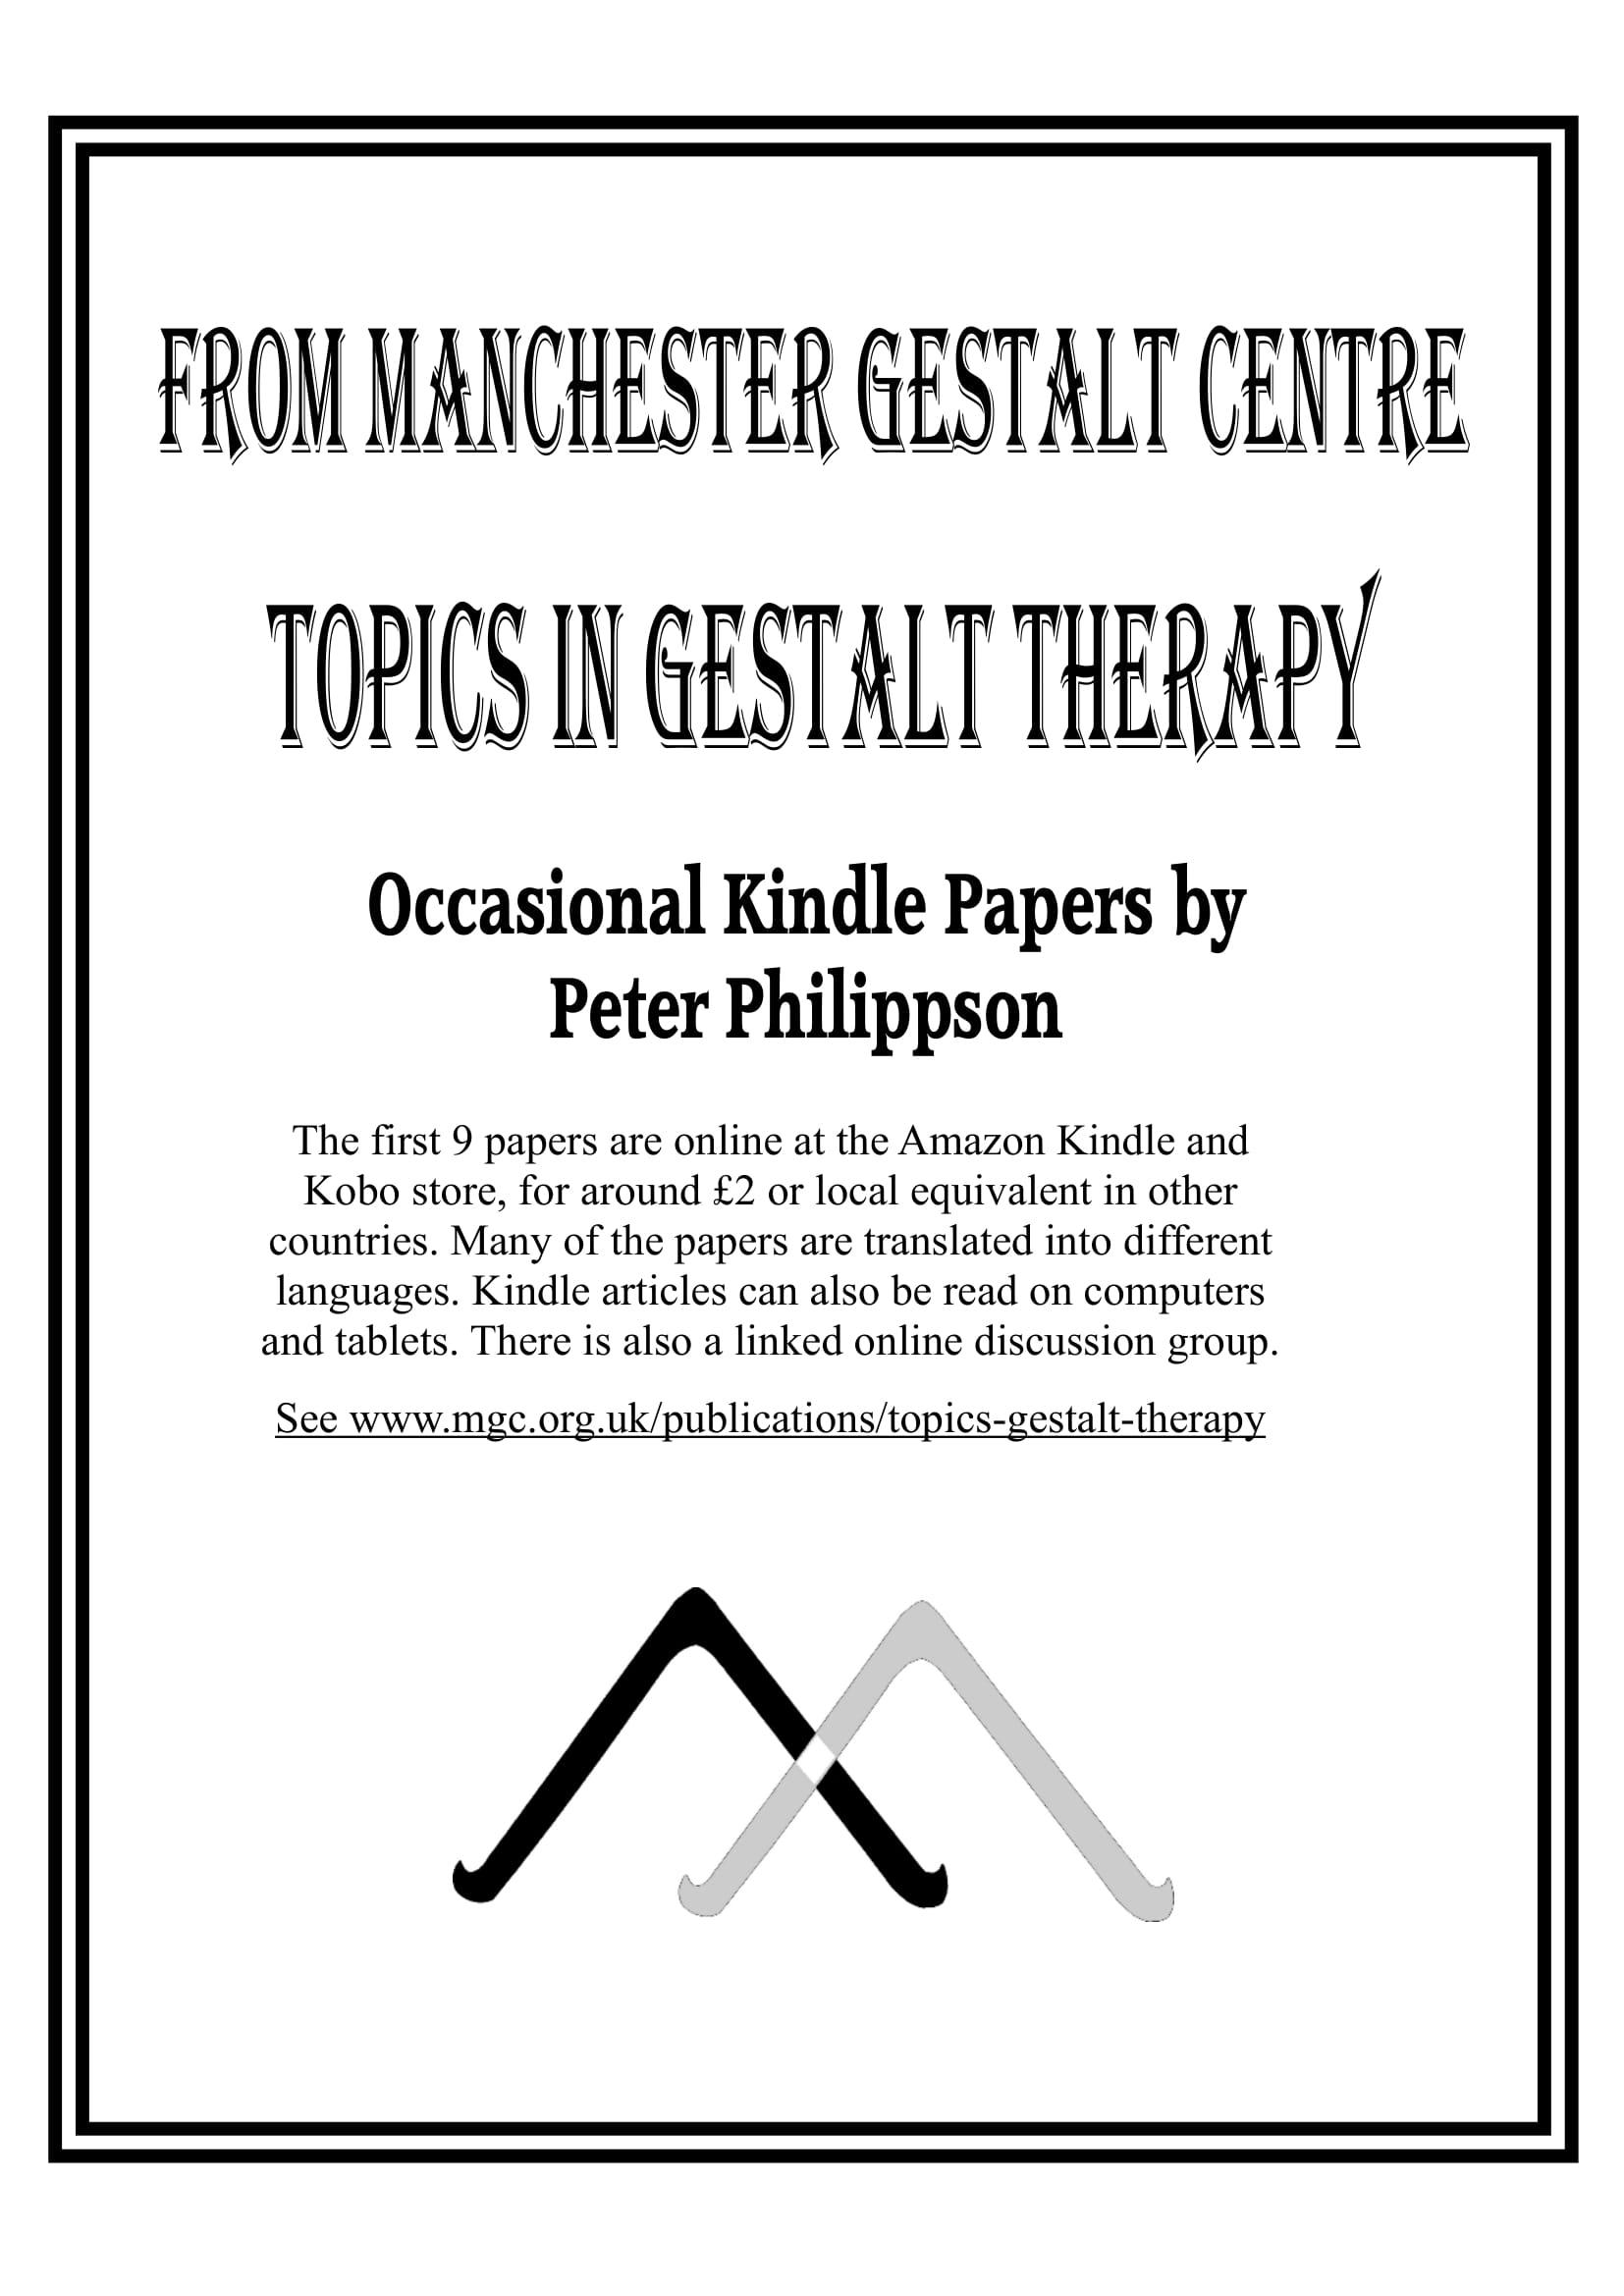 Manchester Gestalt Centre